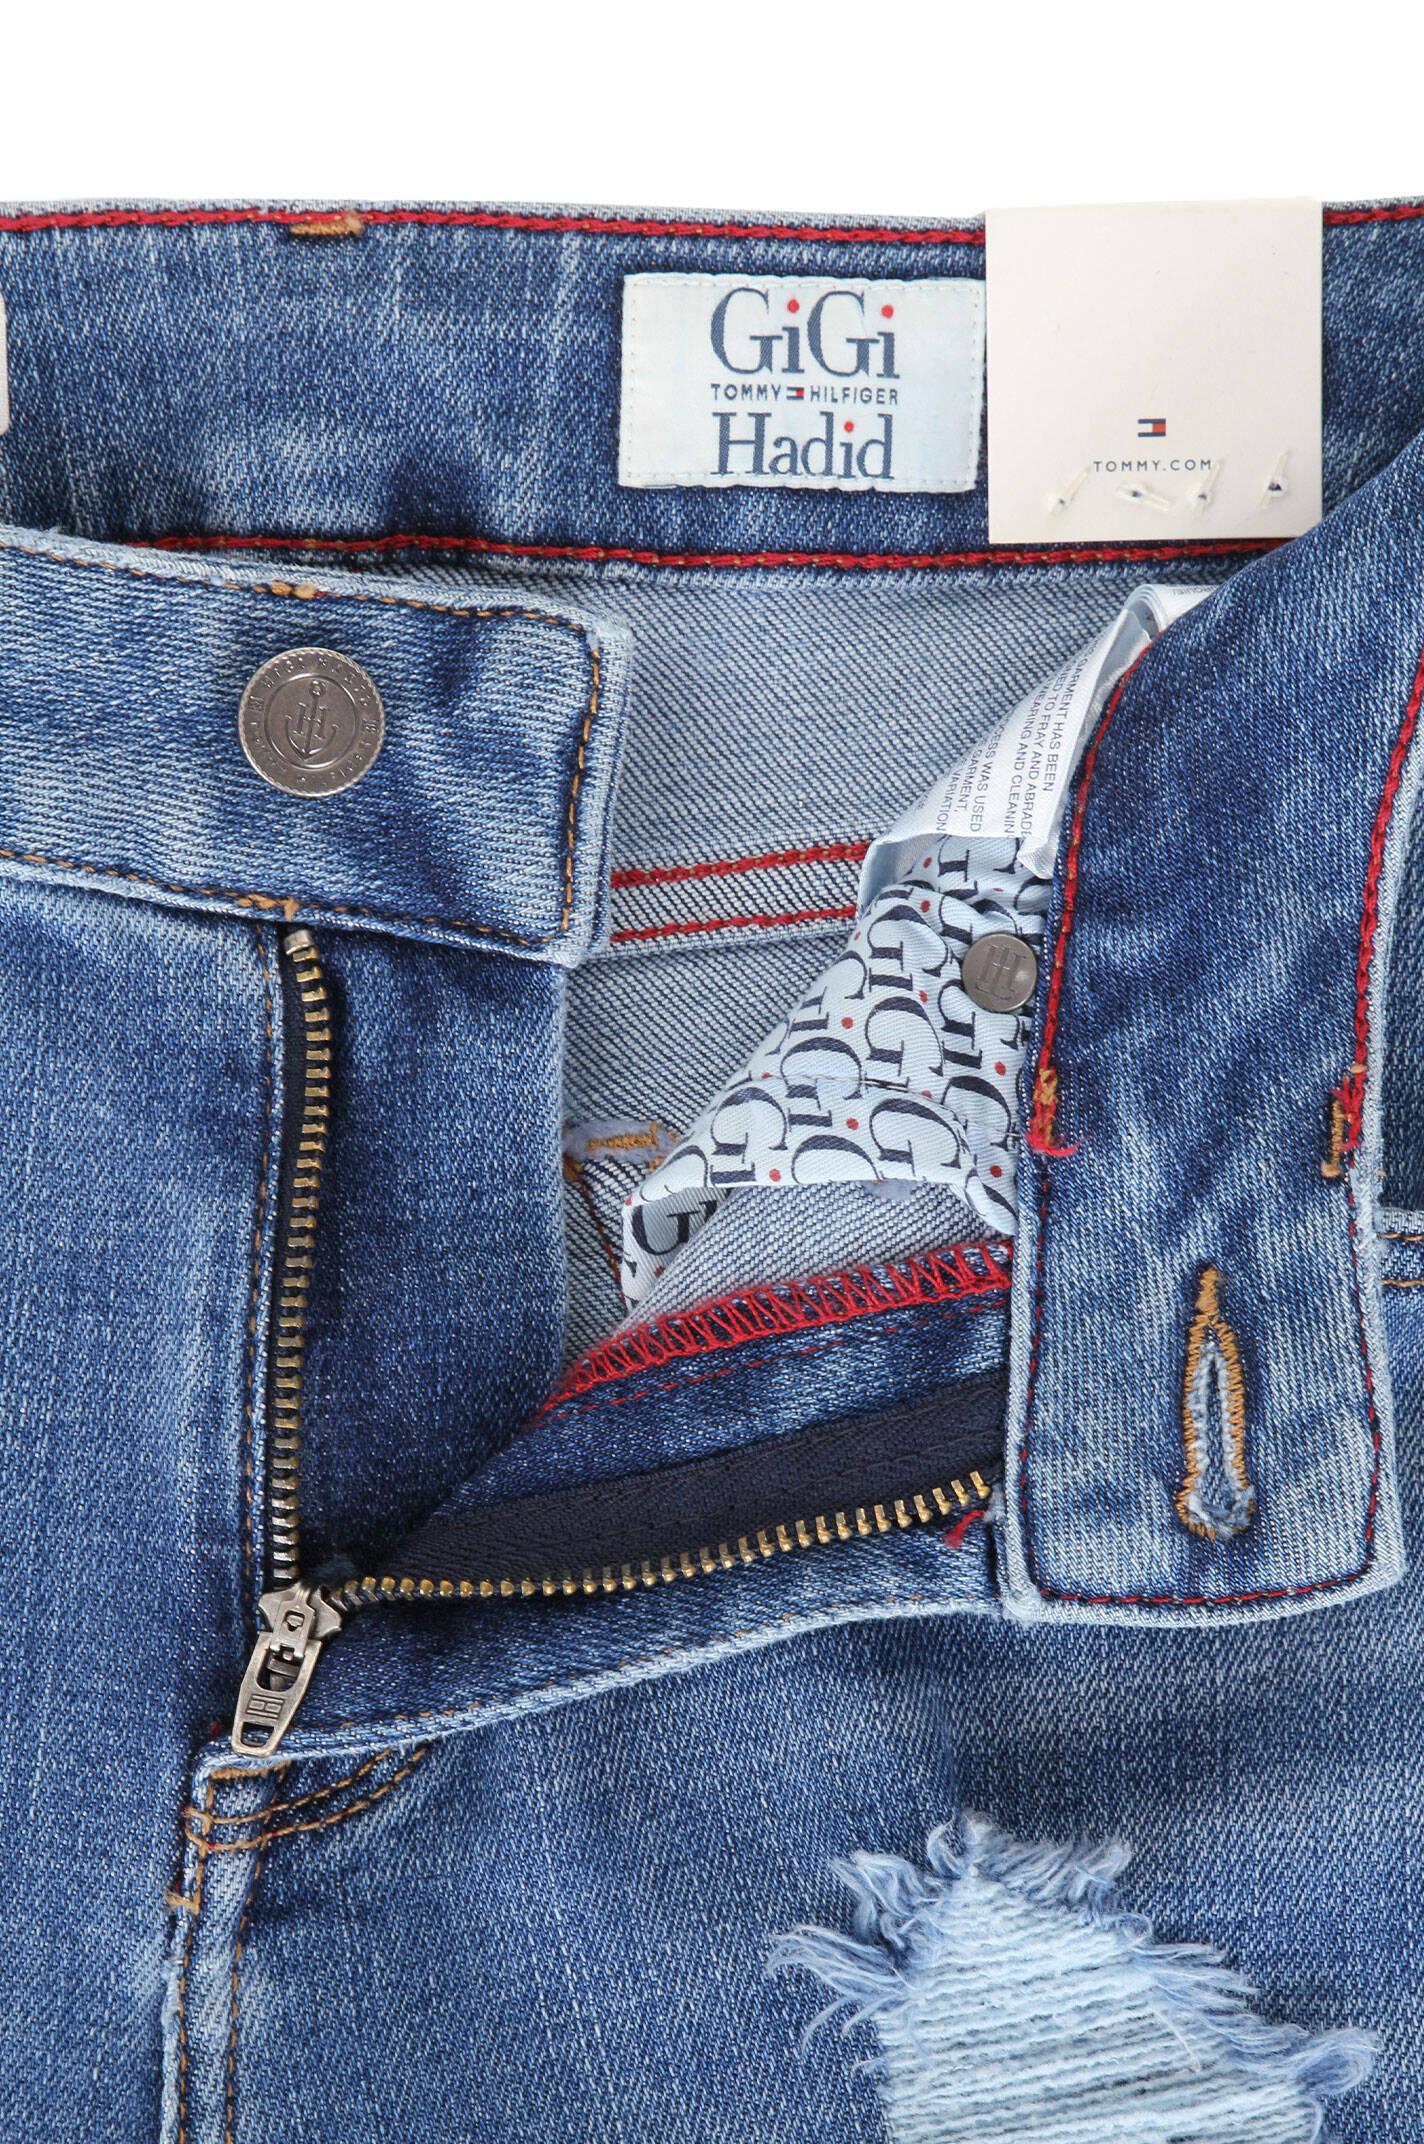 02451df7 Gigi Hadid Venice RW Kylie Jeans Tommy Hilfiger | Blue | Gomez.pl/en